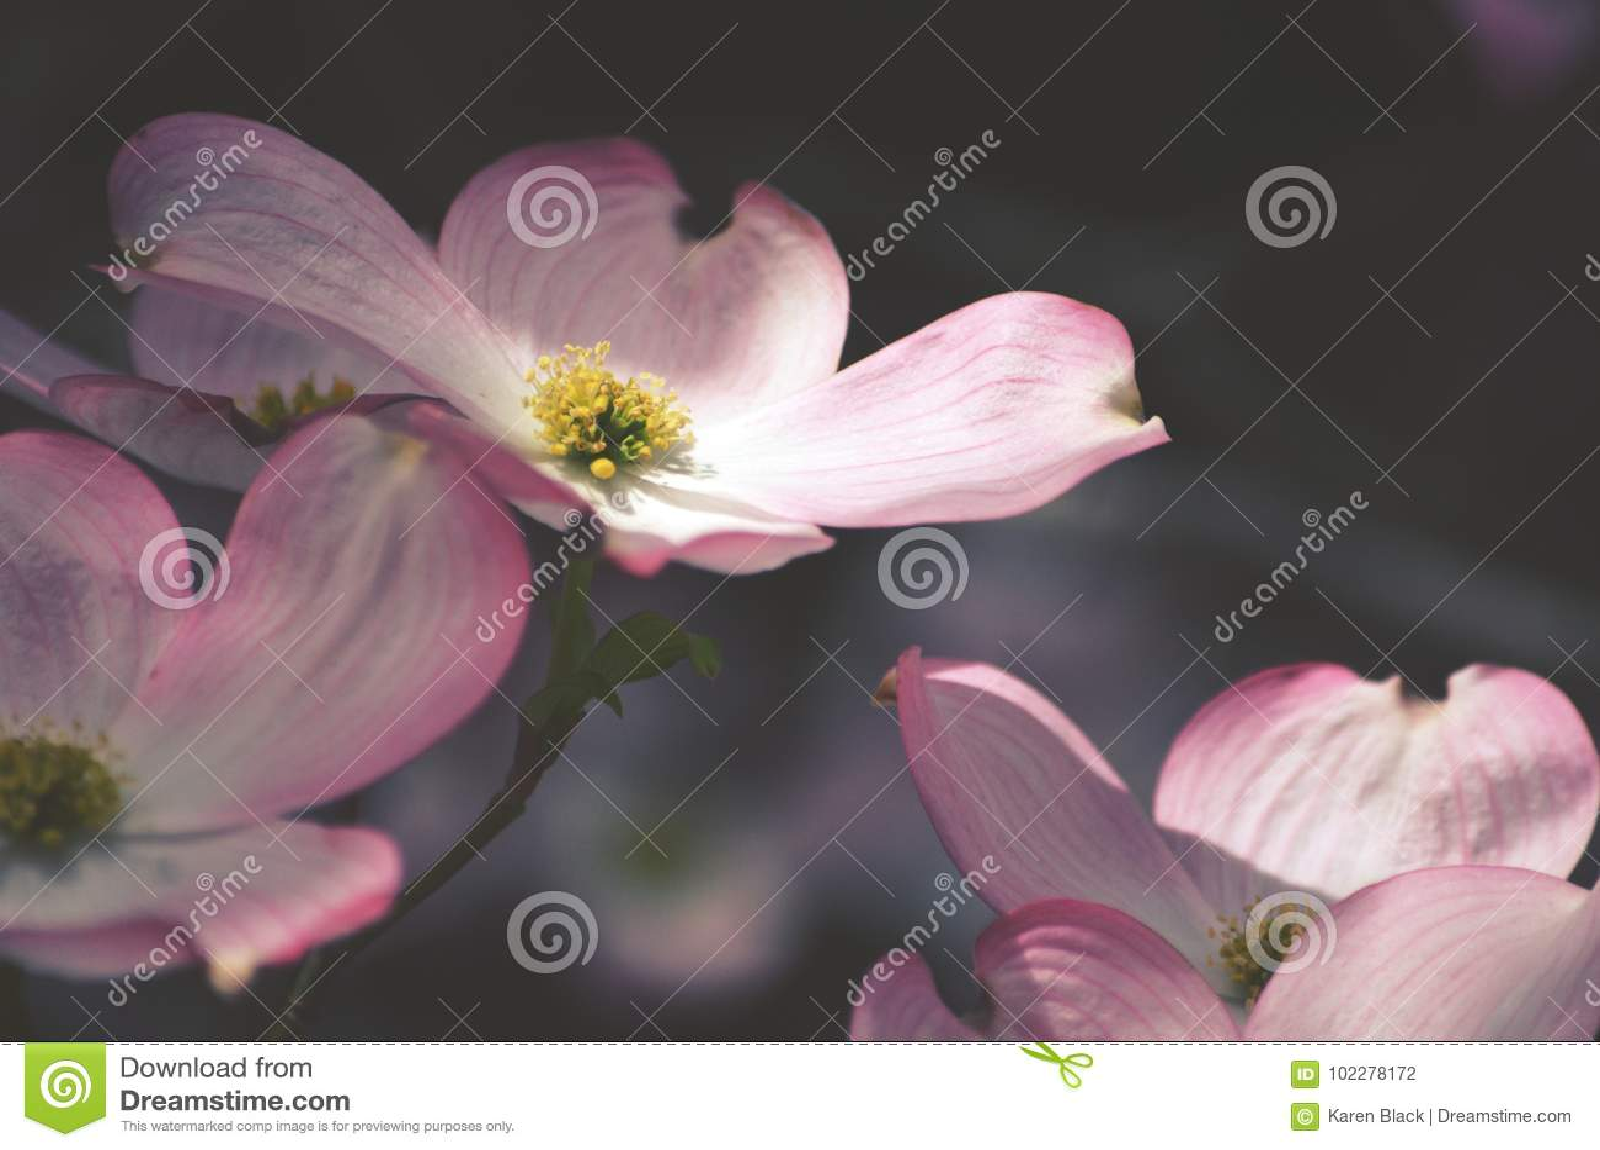 Pink Dogwood Flower Stock Photo Image Of Yellow Blossom 102278172